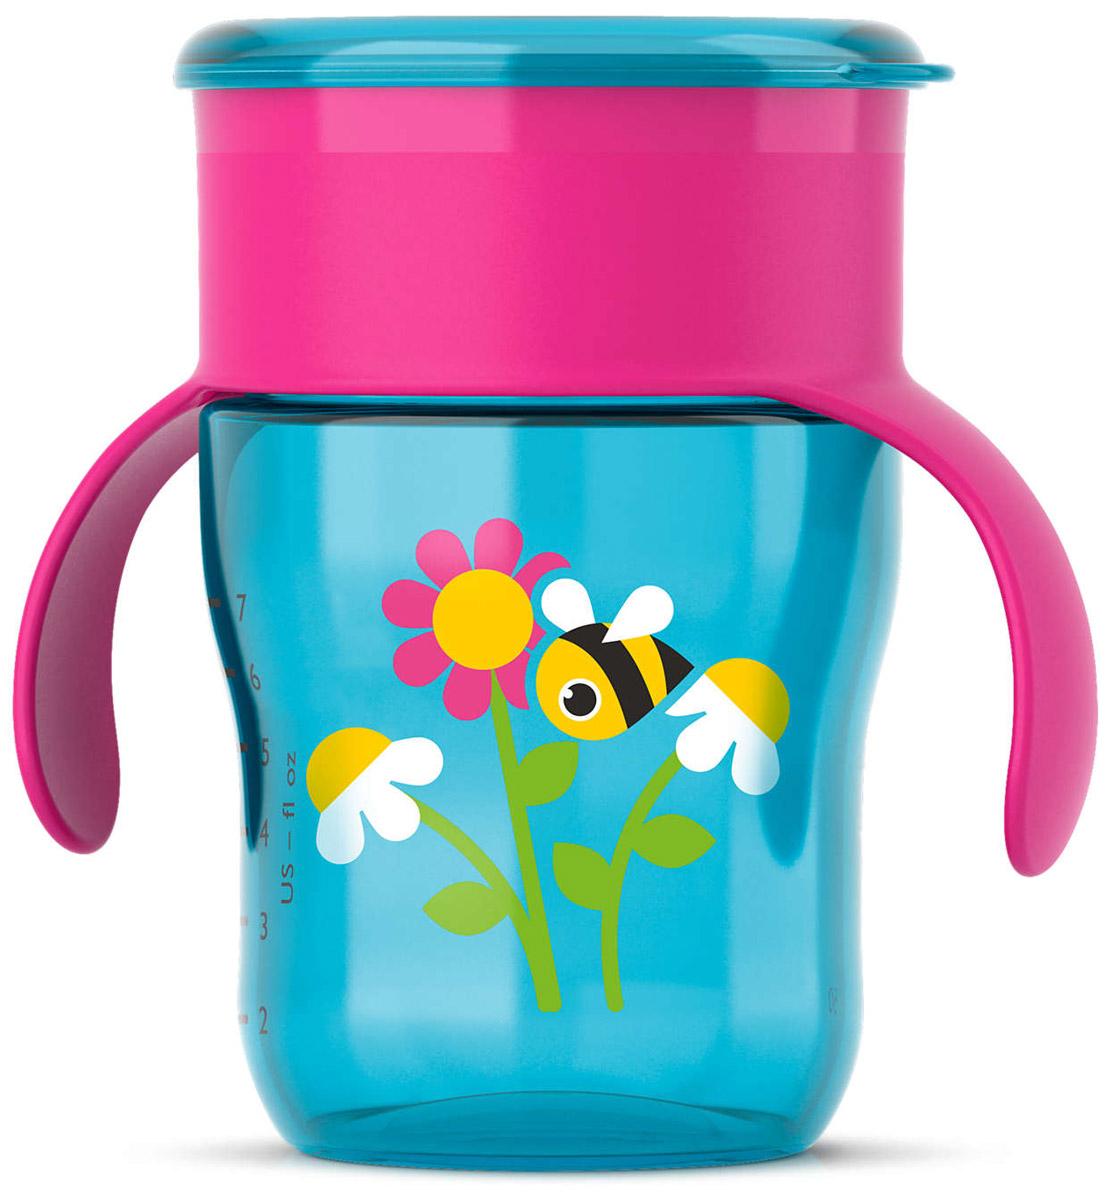 Philips Avent Чашка-поильник от 12 месяцев цвет голубой фуксия 260 мл пчелка SCF782/20